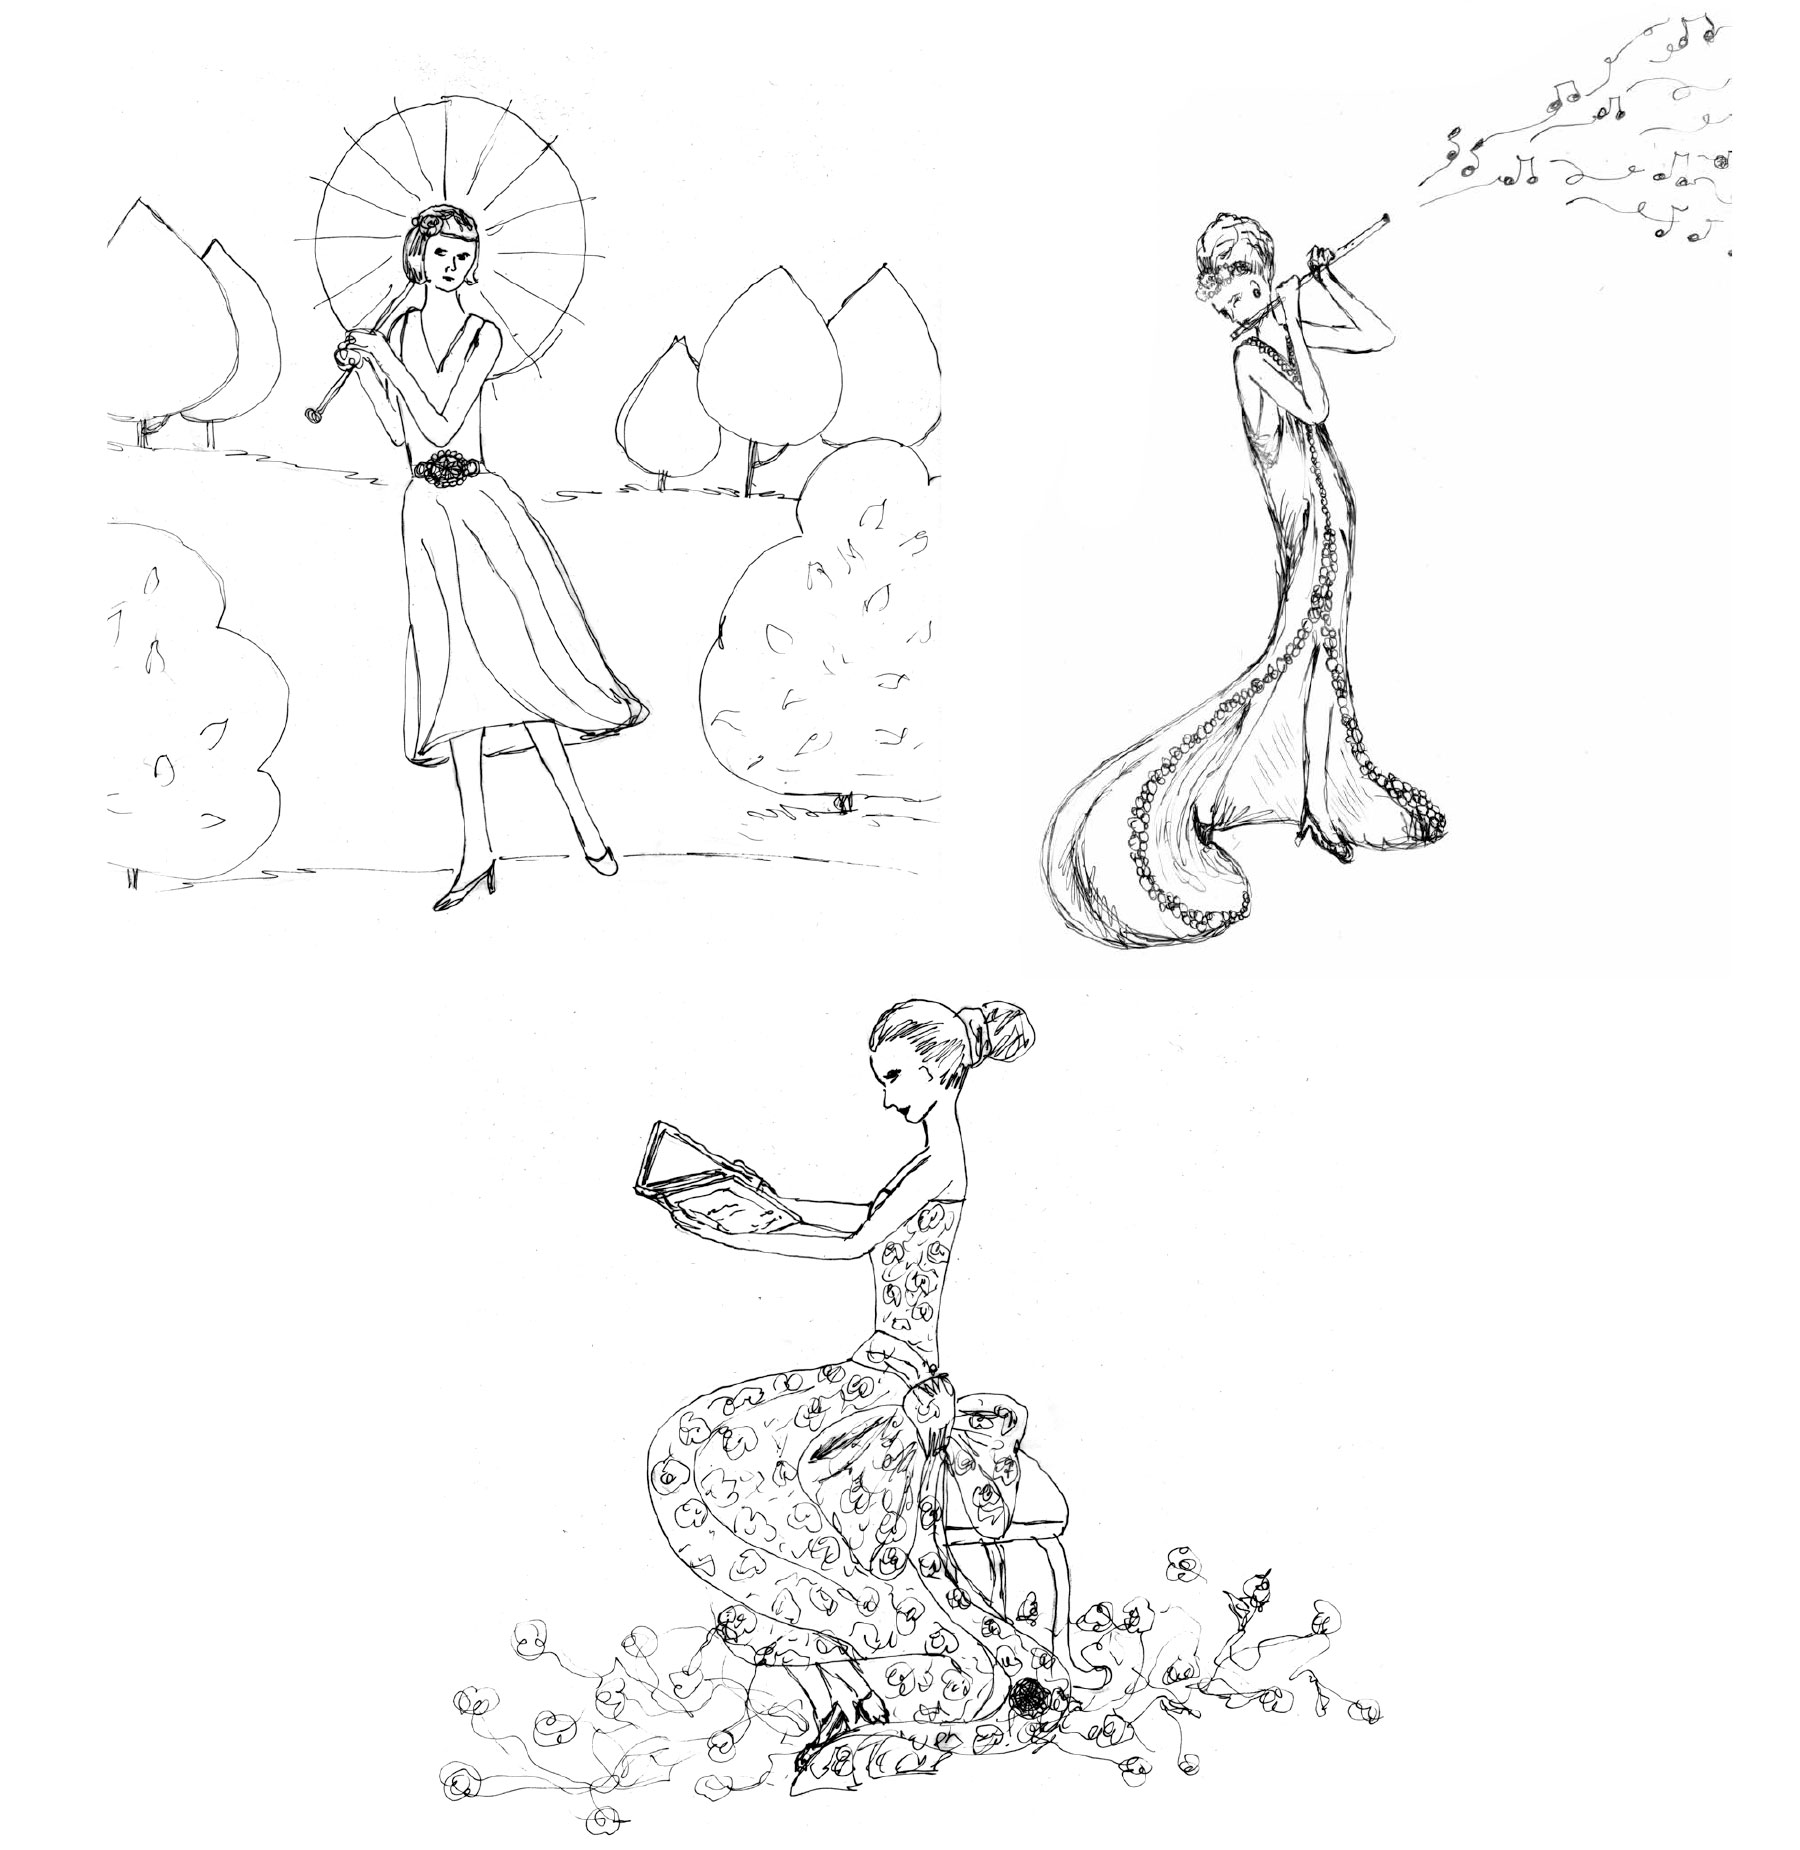 ceci_johnson_ceci_new_york_orali_perfume_custom_branding_logo_design_business_collateral_illustration_v242_03